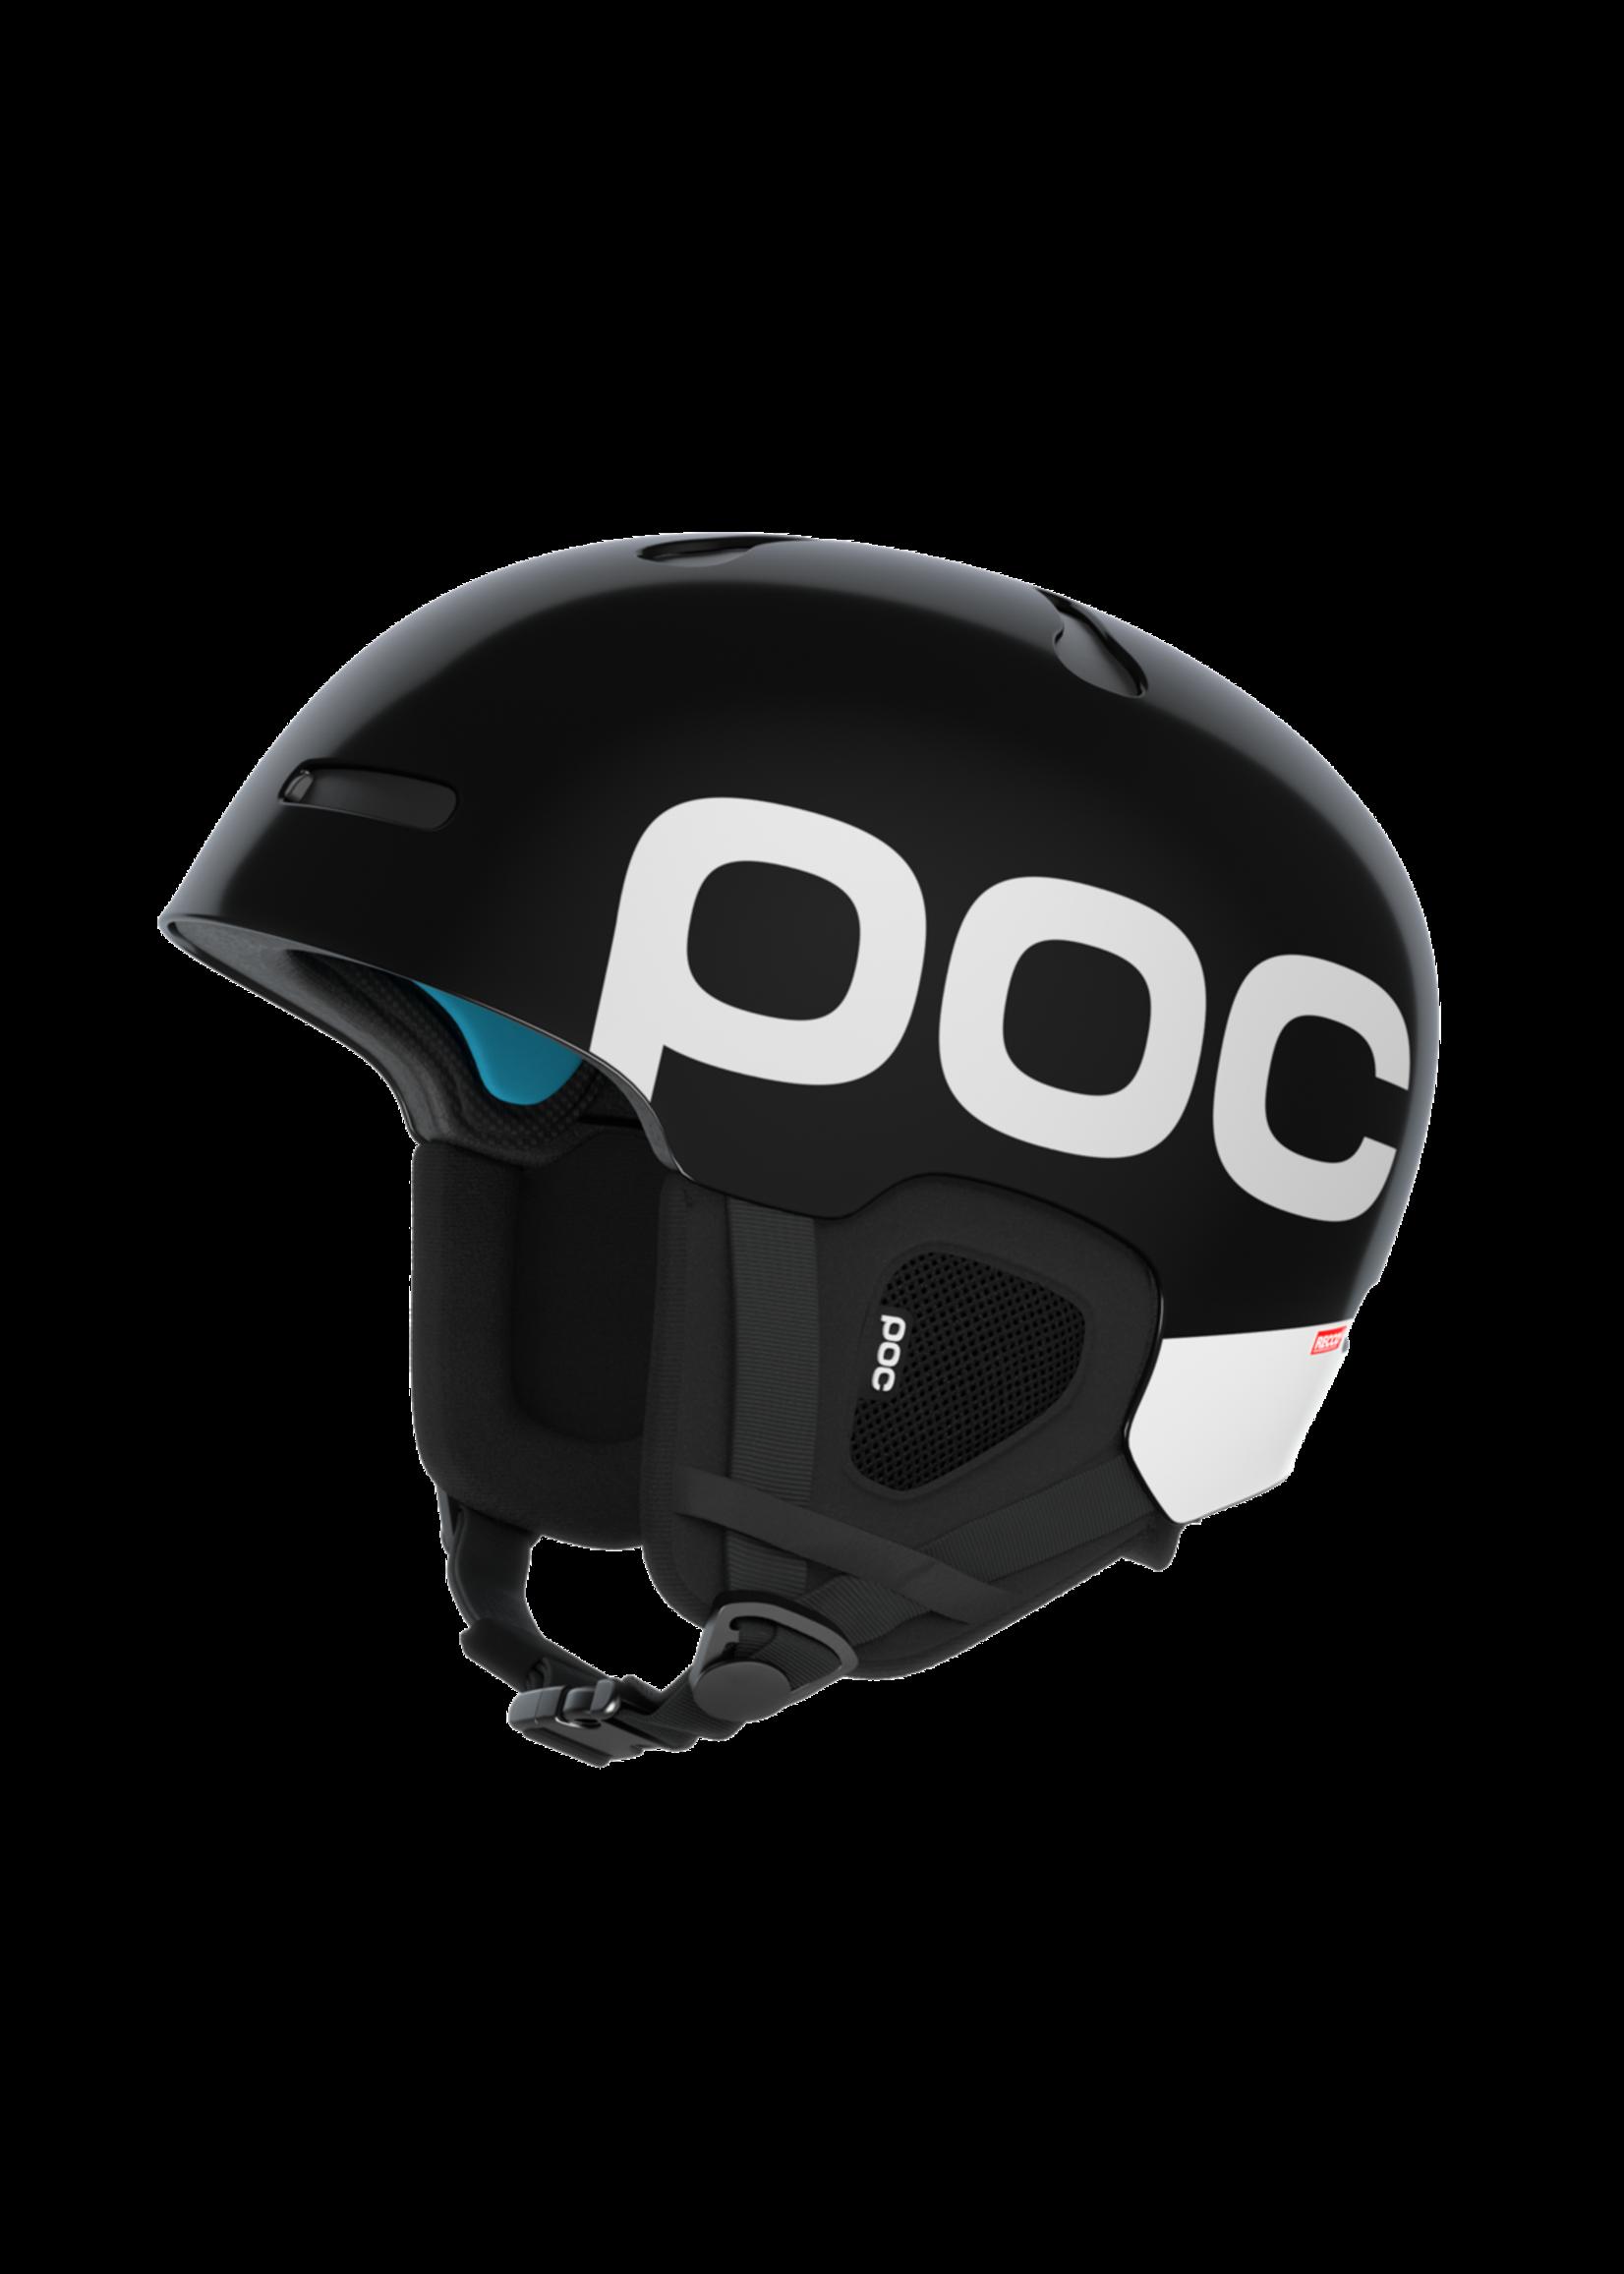 POC Touring Helmet Auric Cut BC Spin